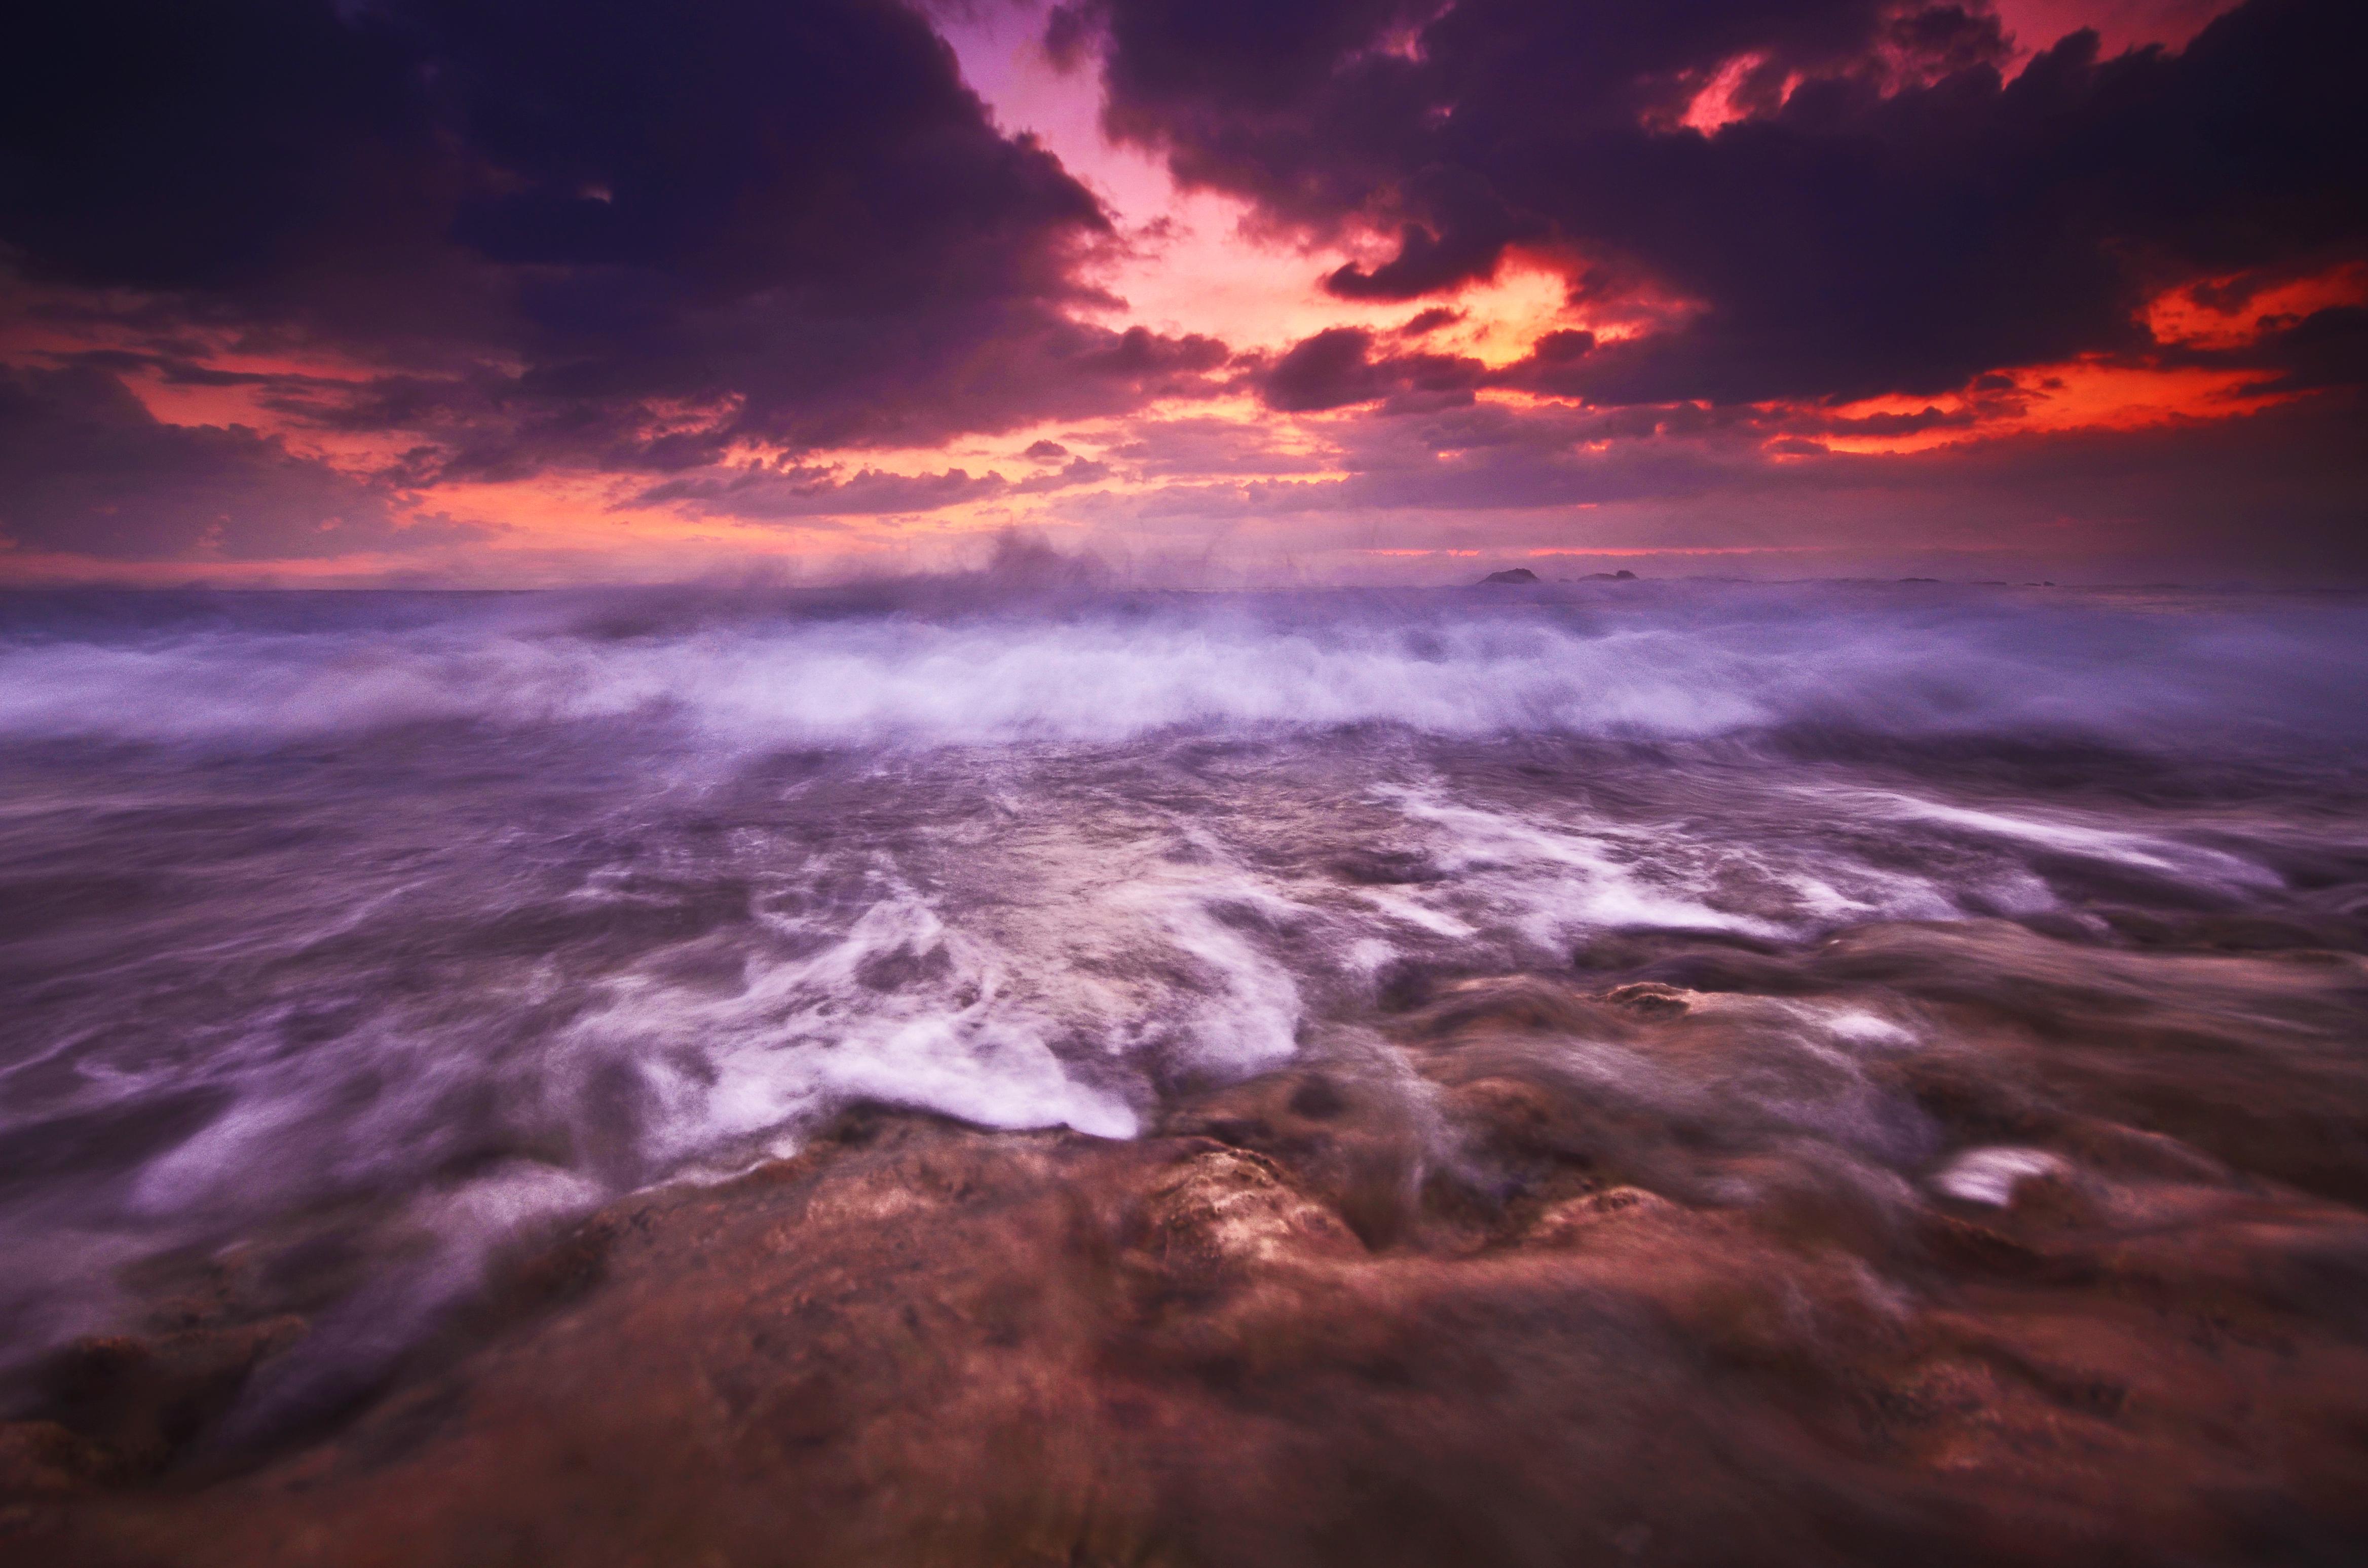 Sri Lanka Sunset by comsic